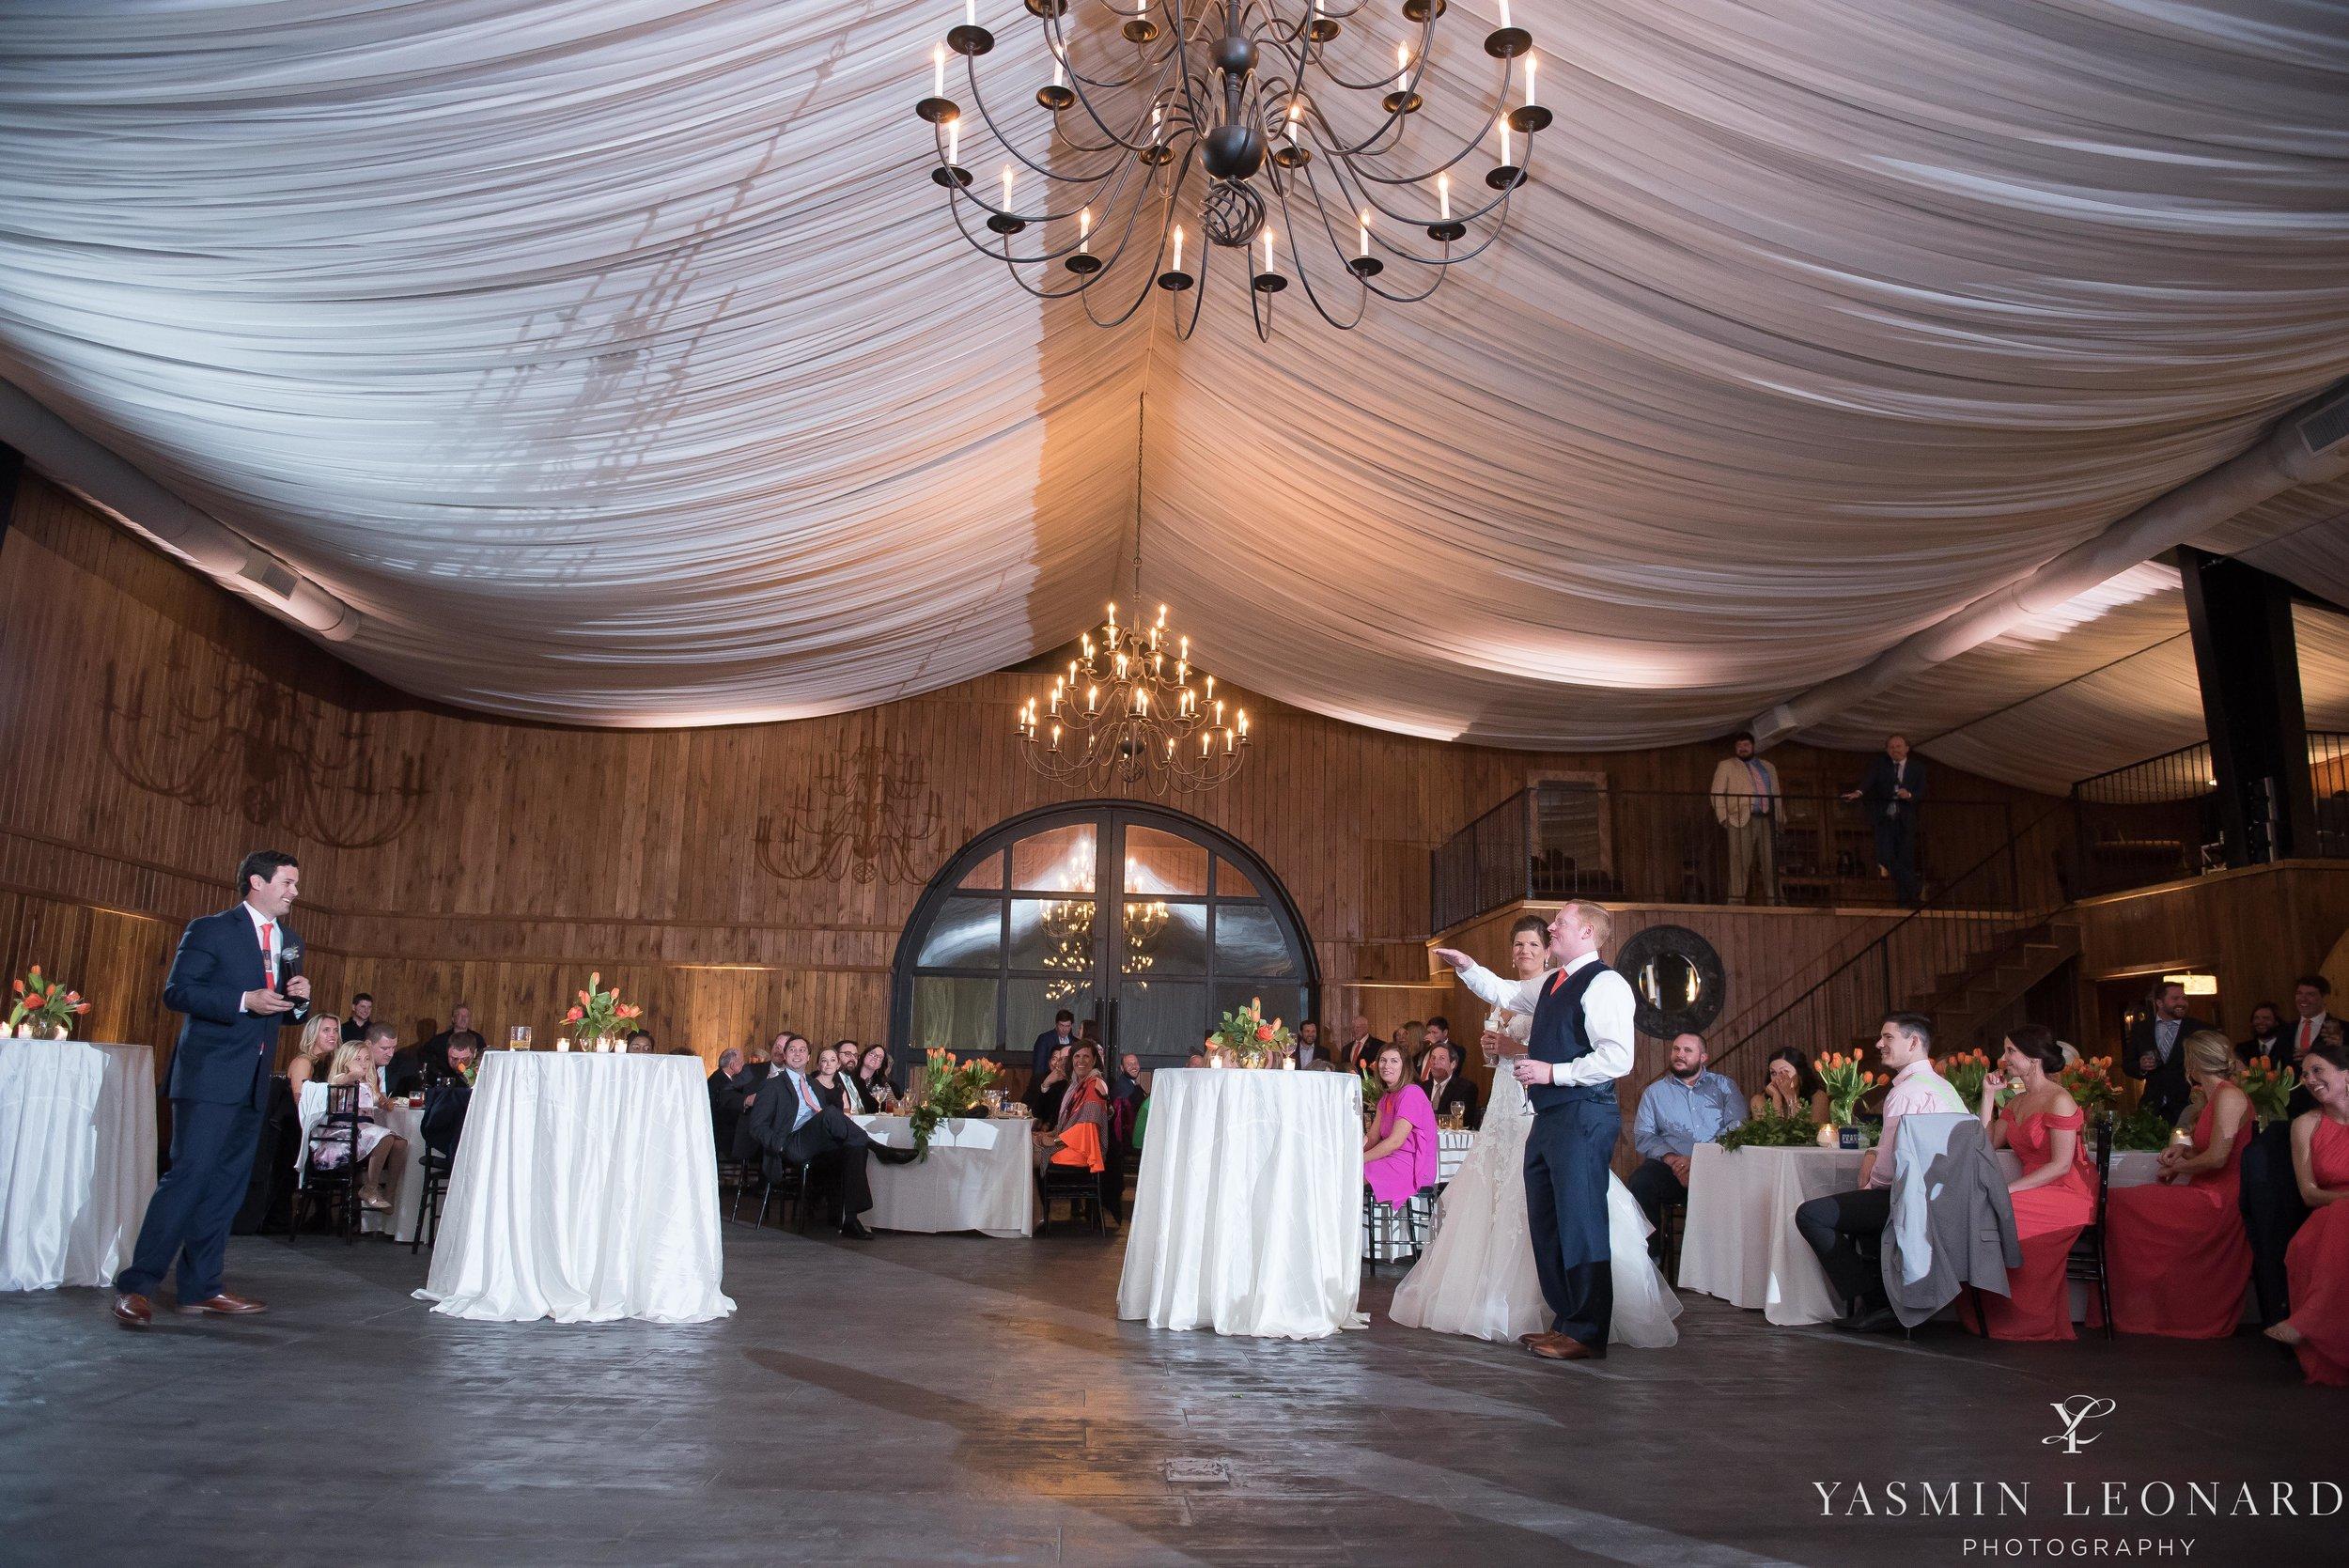 Adaumont Farm - Adaumont Farm Weddings - Trinity Weddings - NC Weddings - Yasmin Leonard Photography-68.jpg